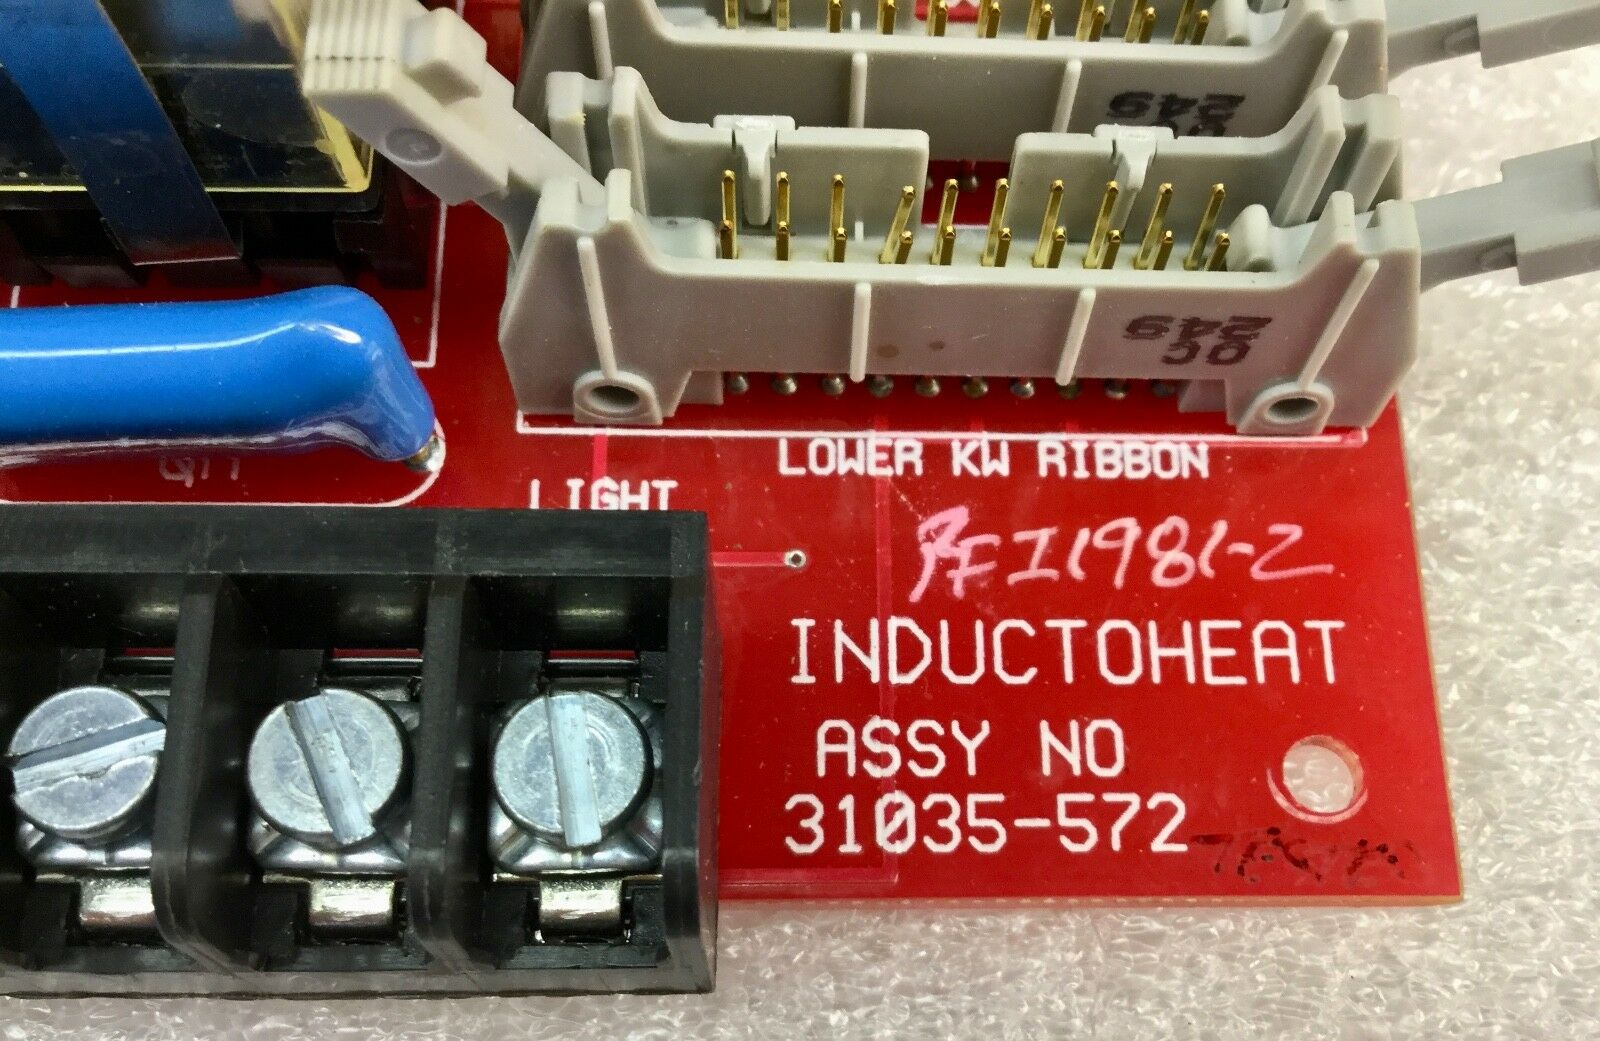 INDUCTOHEAT CONTROL BOARD 31035-572 *PZF*